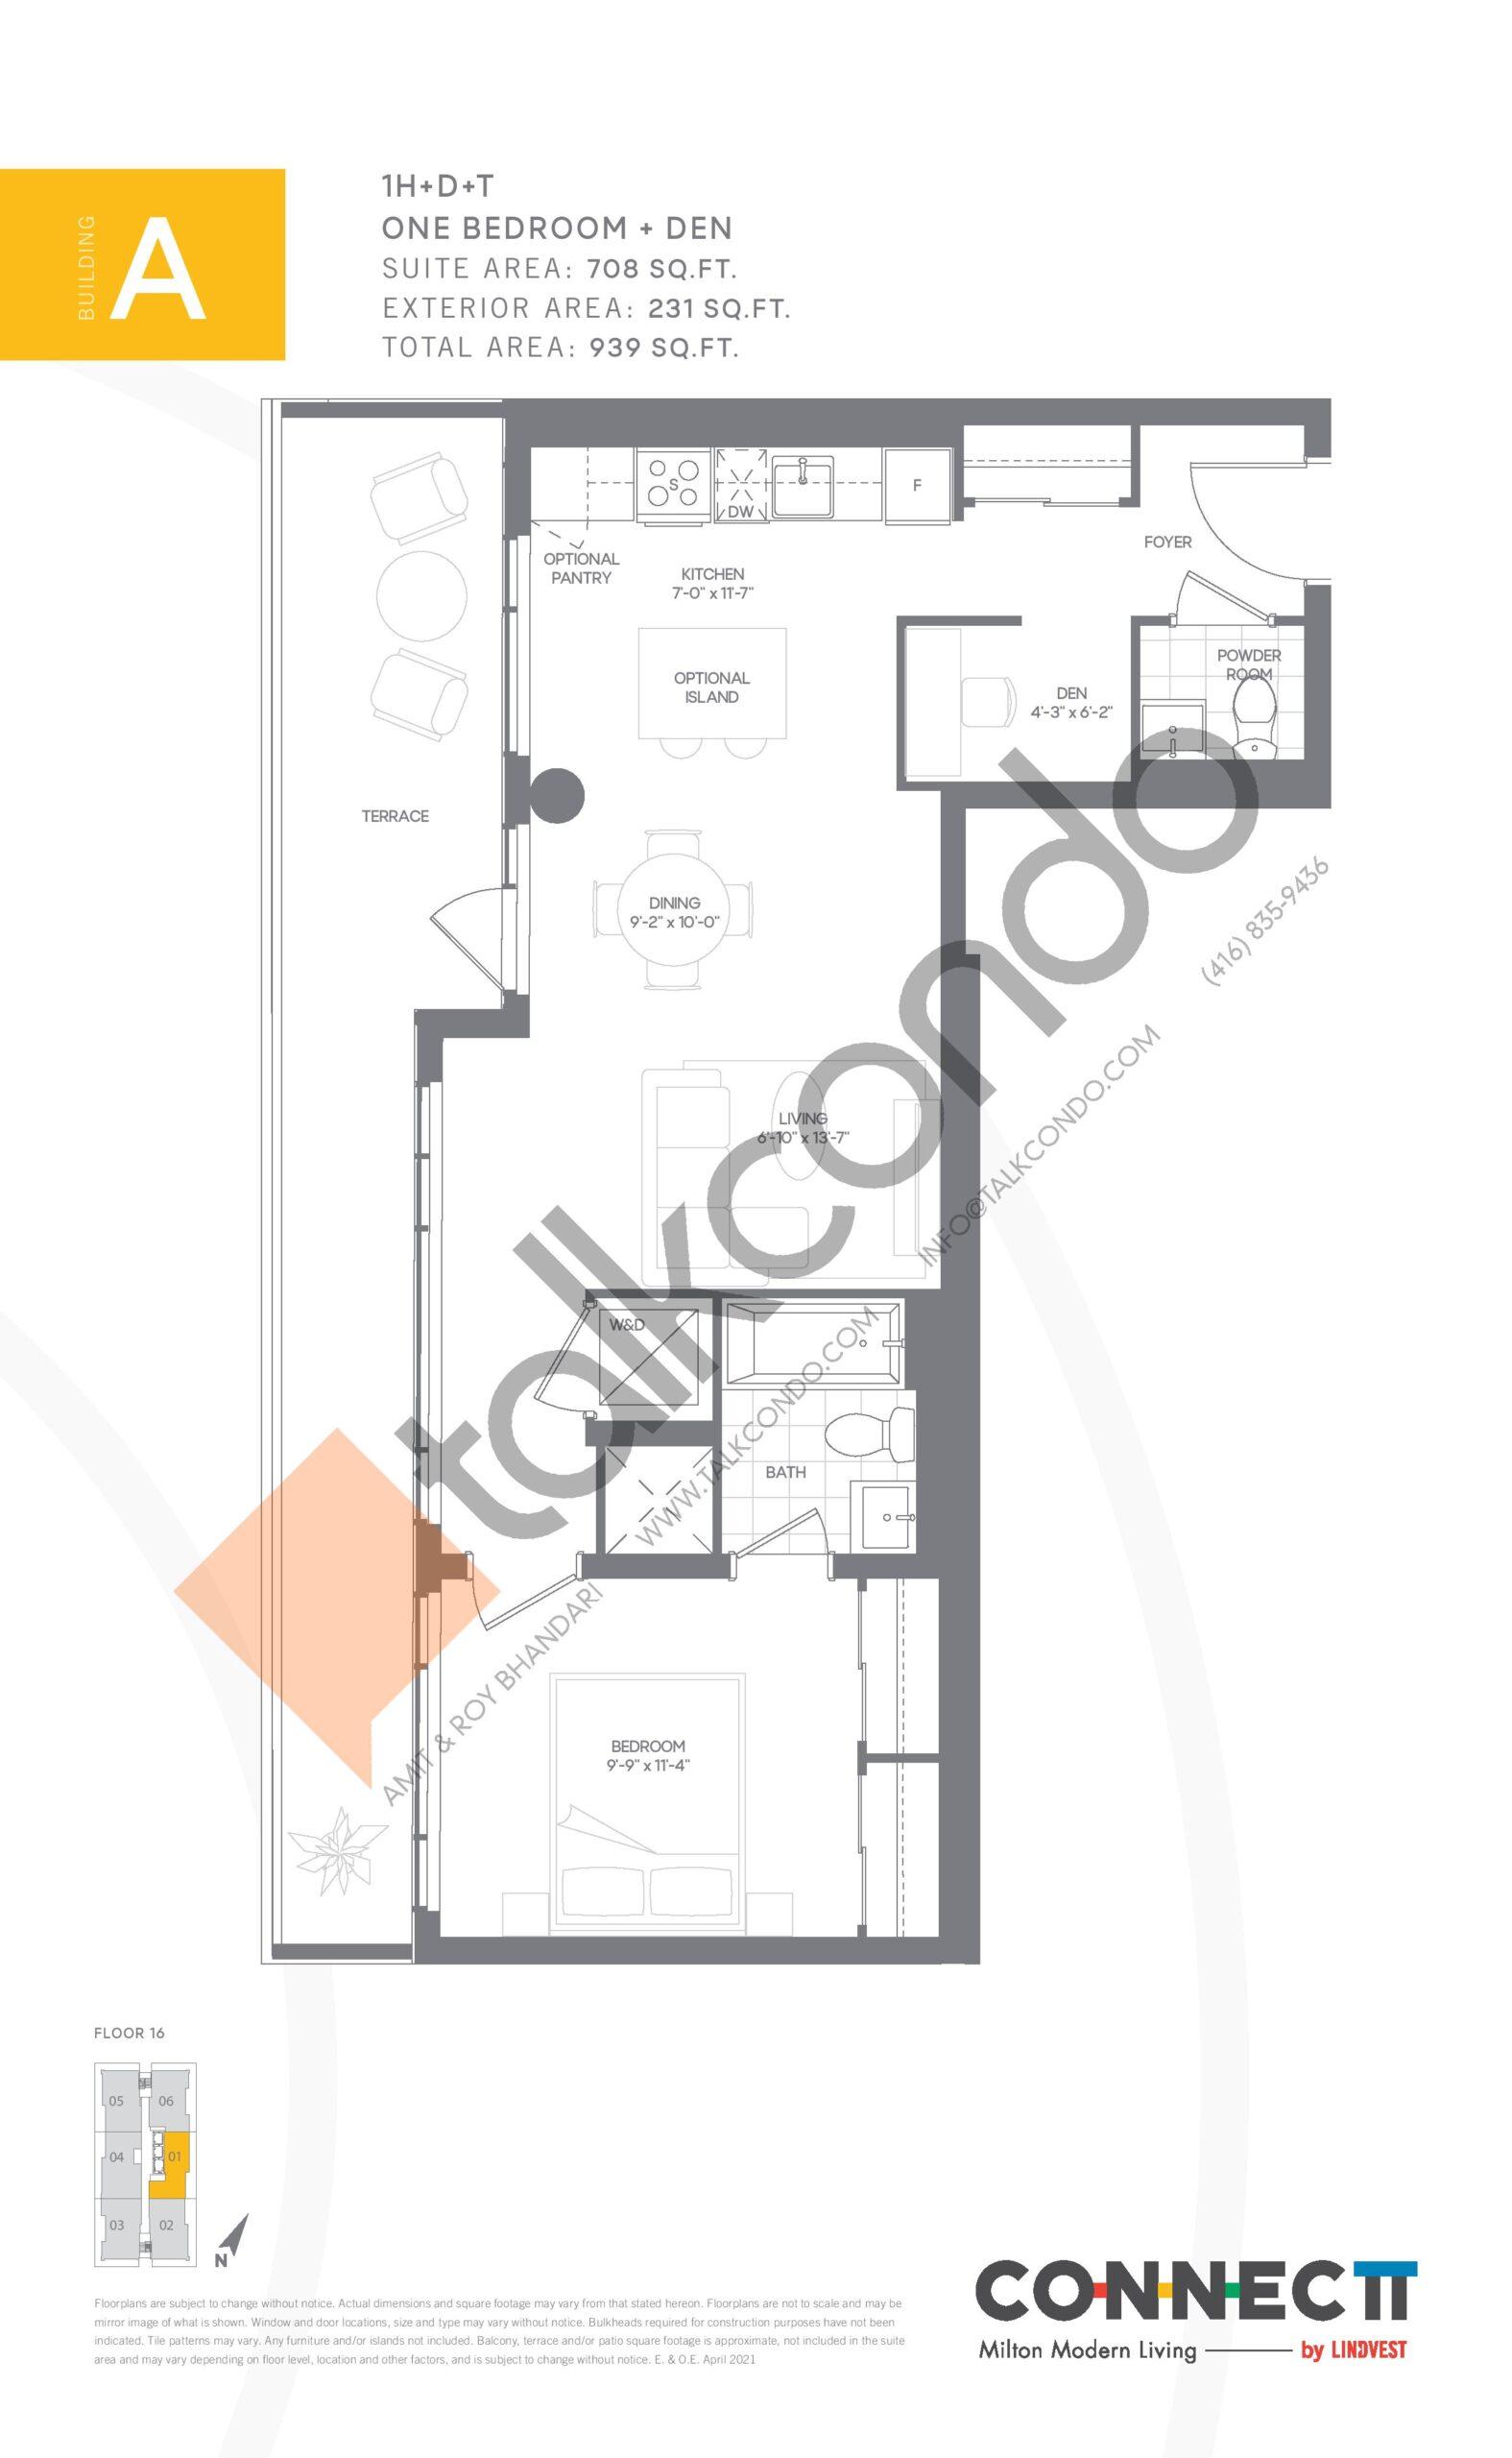 1H+D+T Floor Plan at Connectt Urban Community Condos - 708 sq.ft